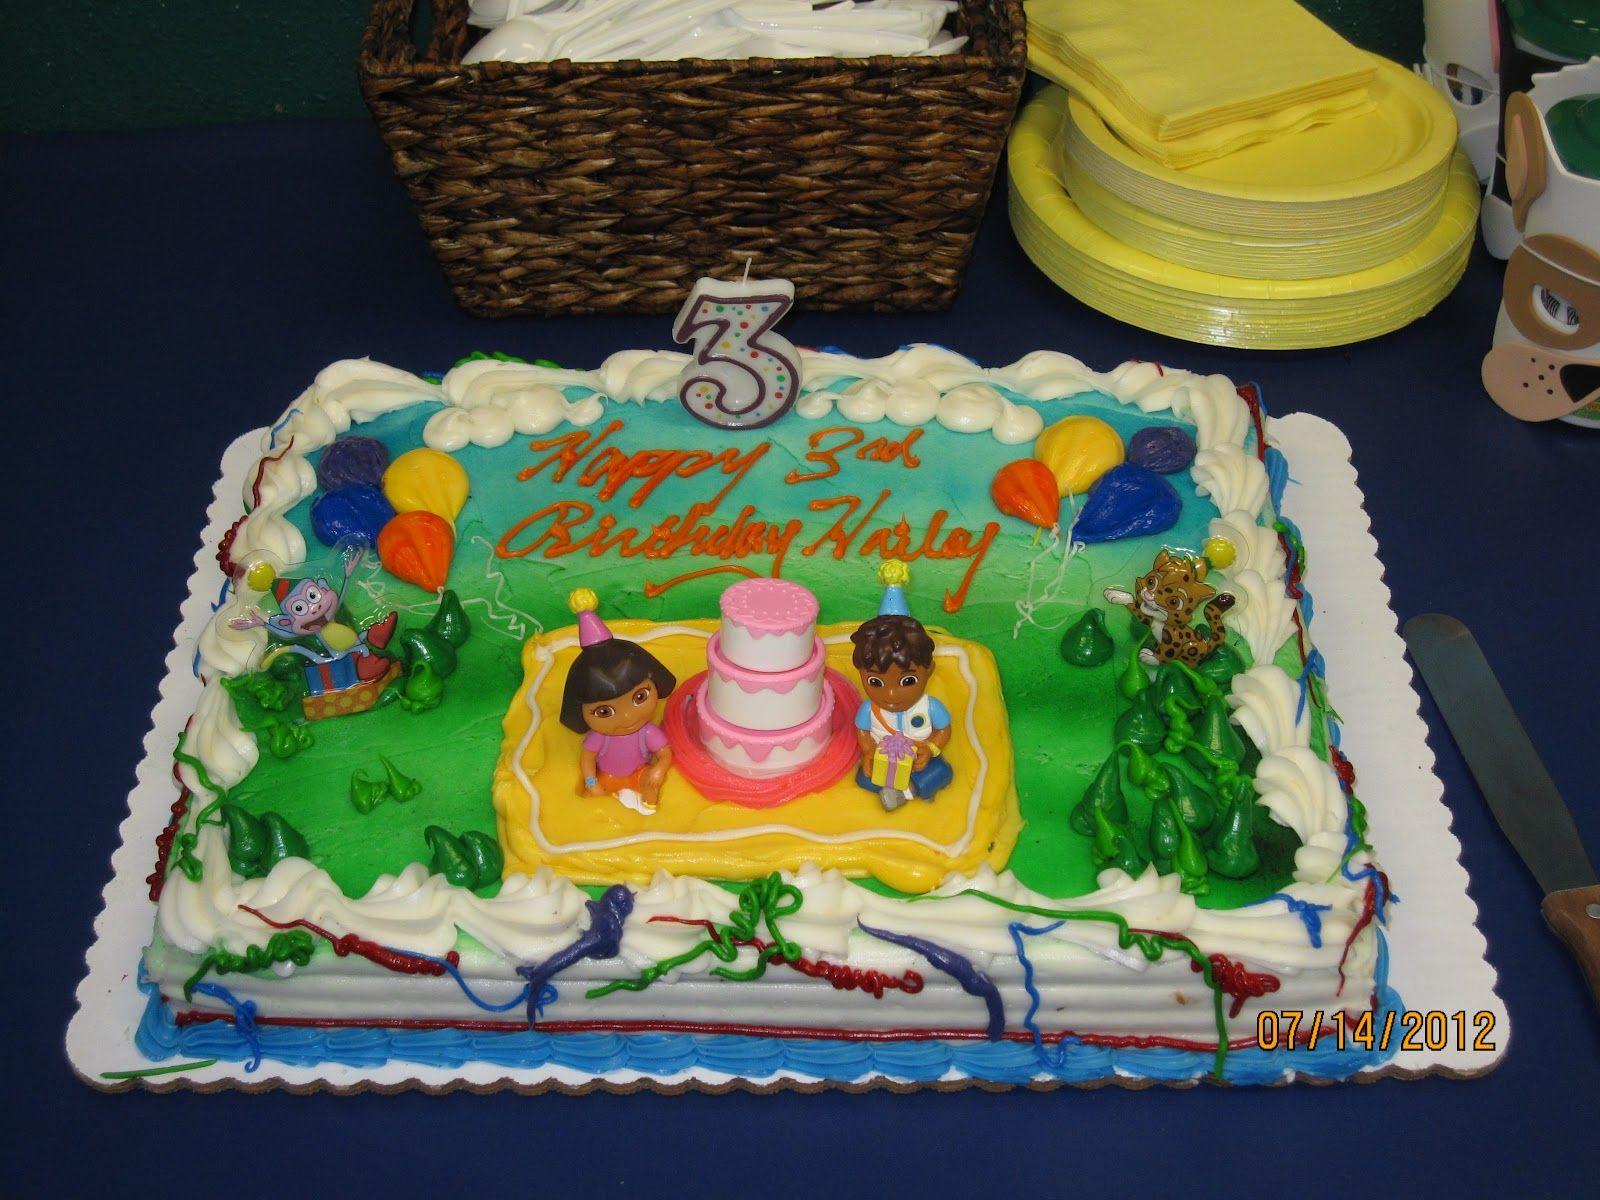 Dora Cake Recipe In English: Dora And Diego Cake